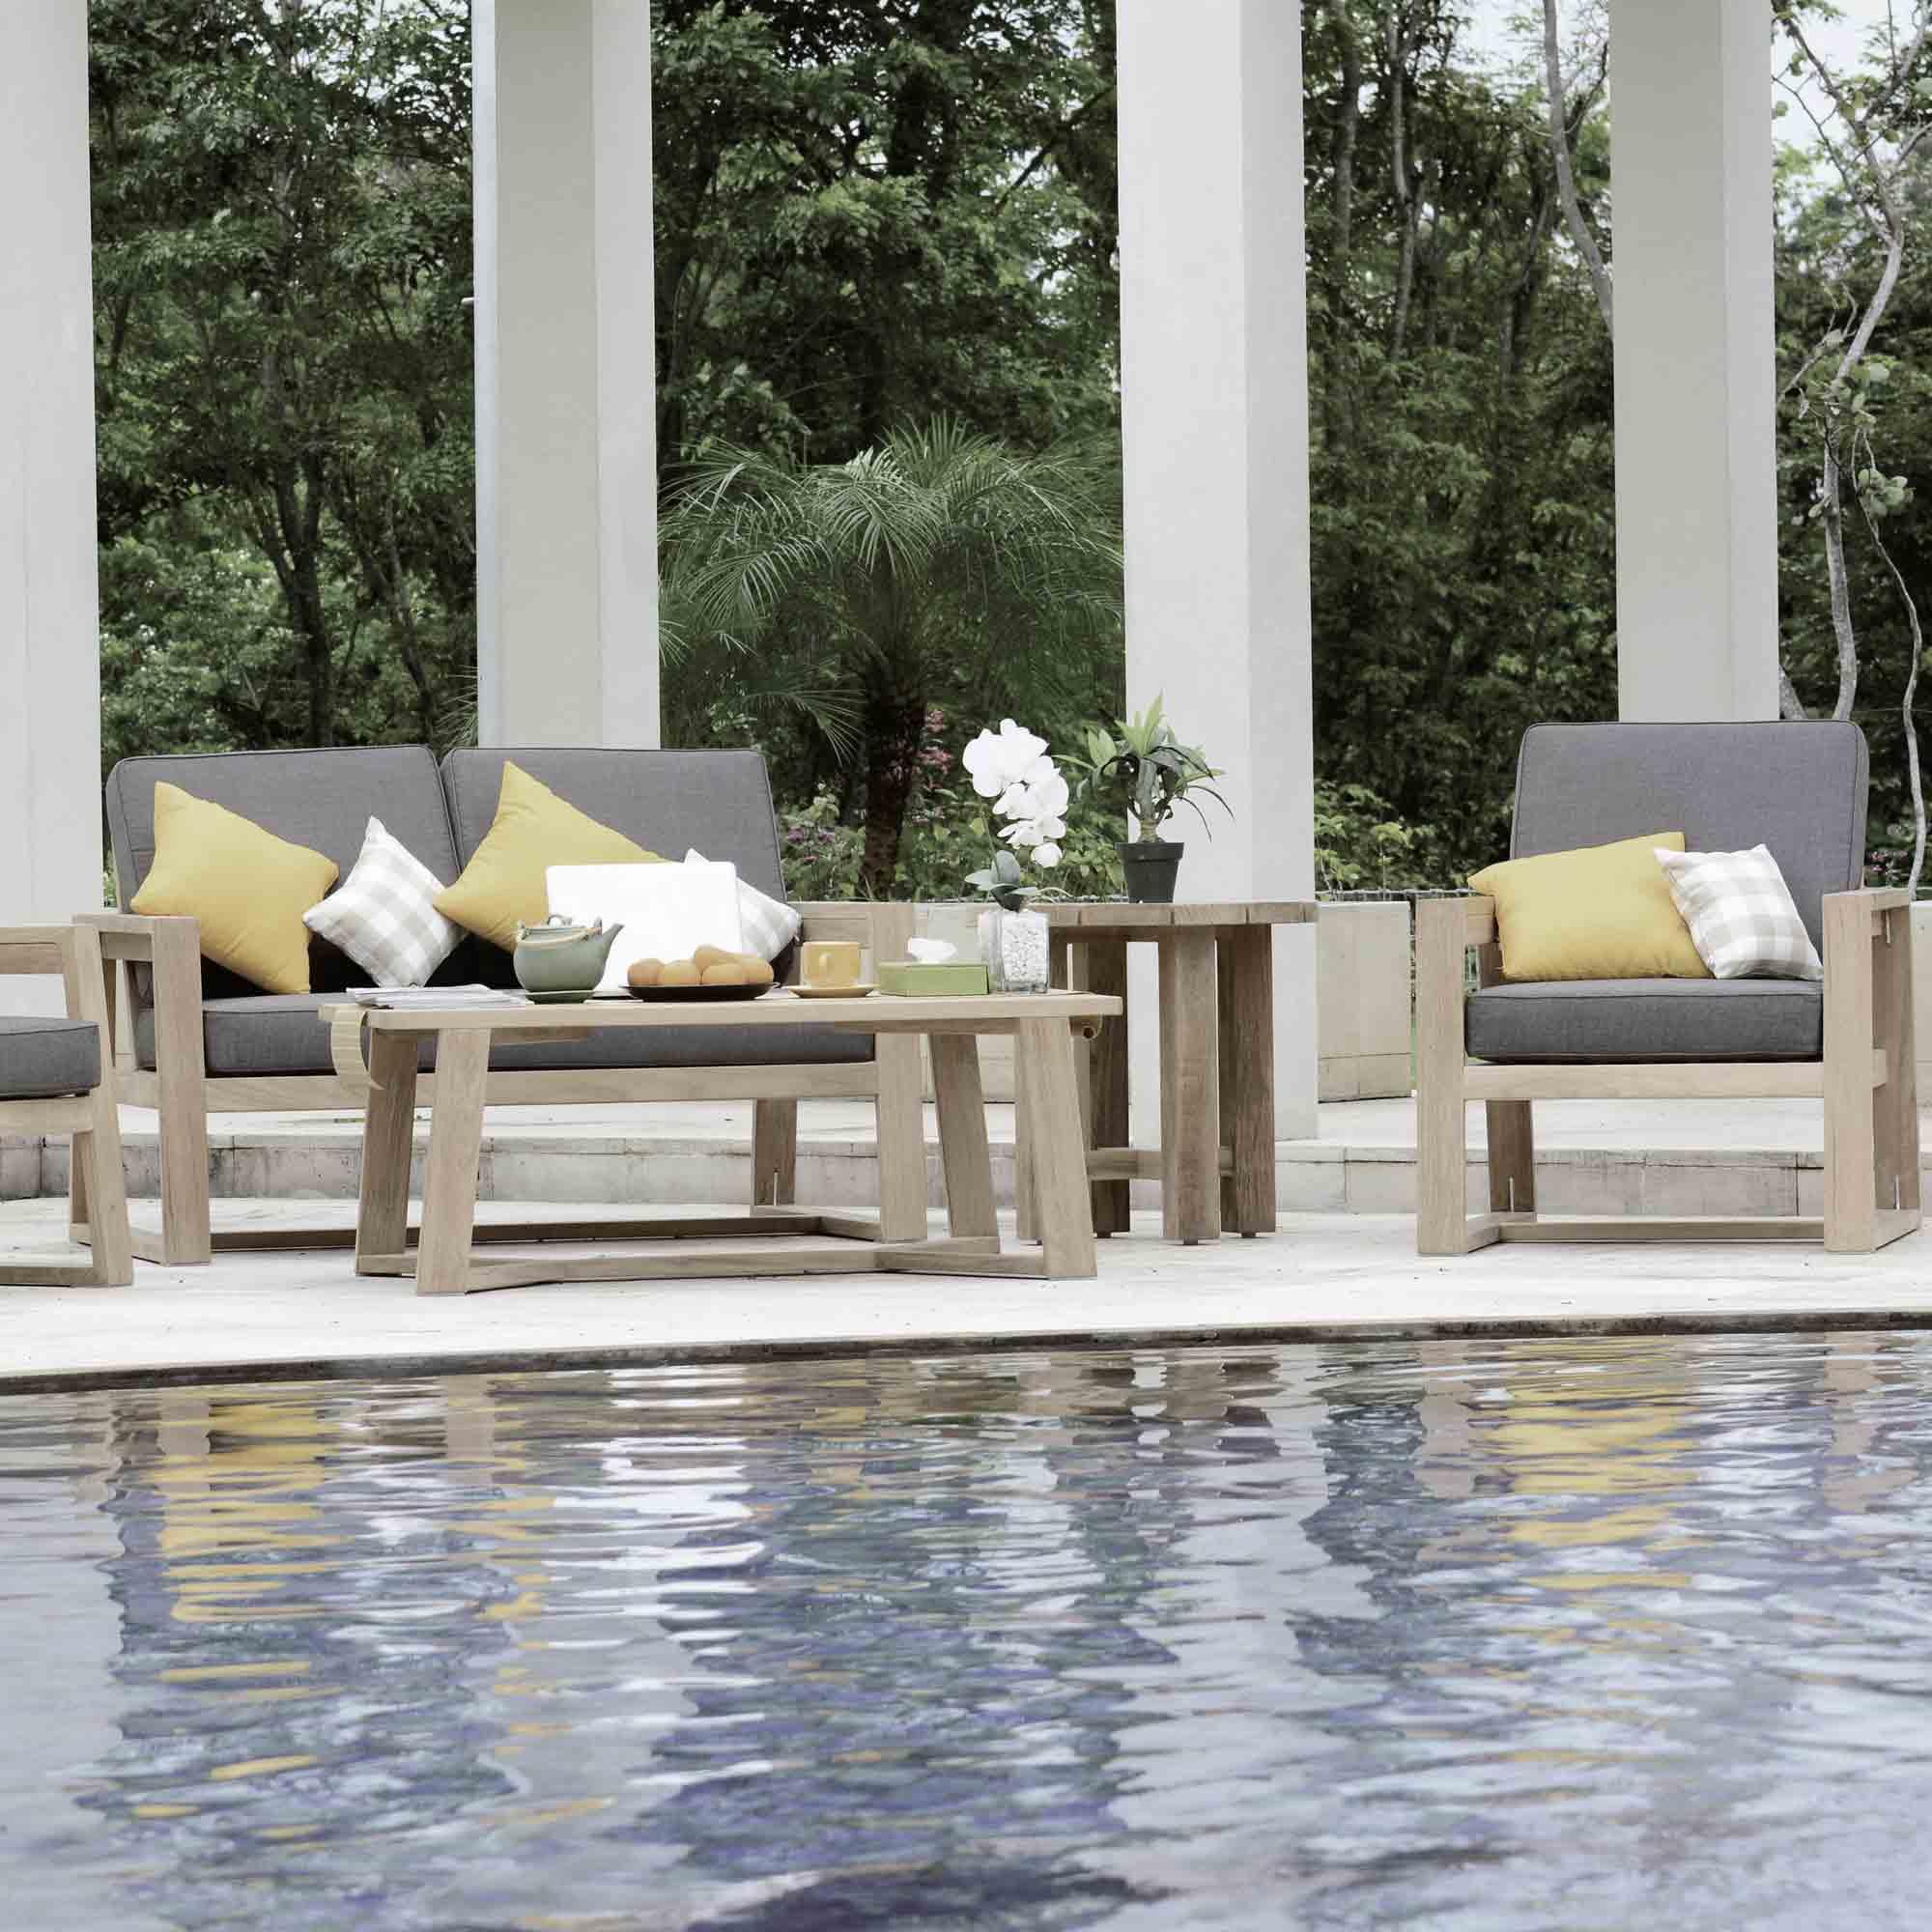 Gartenmöbel aus Holz am Pool – Holzland Verbeek